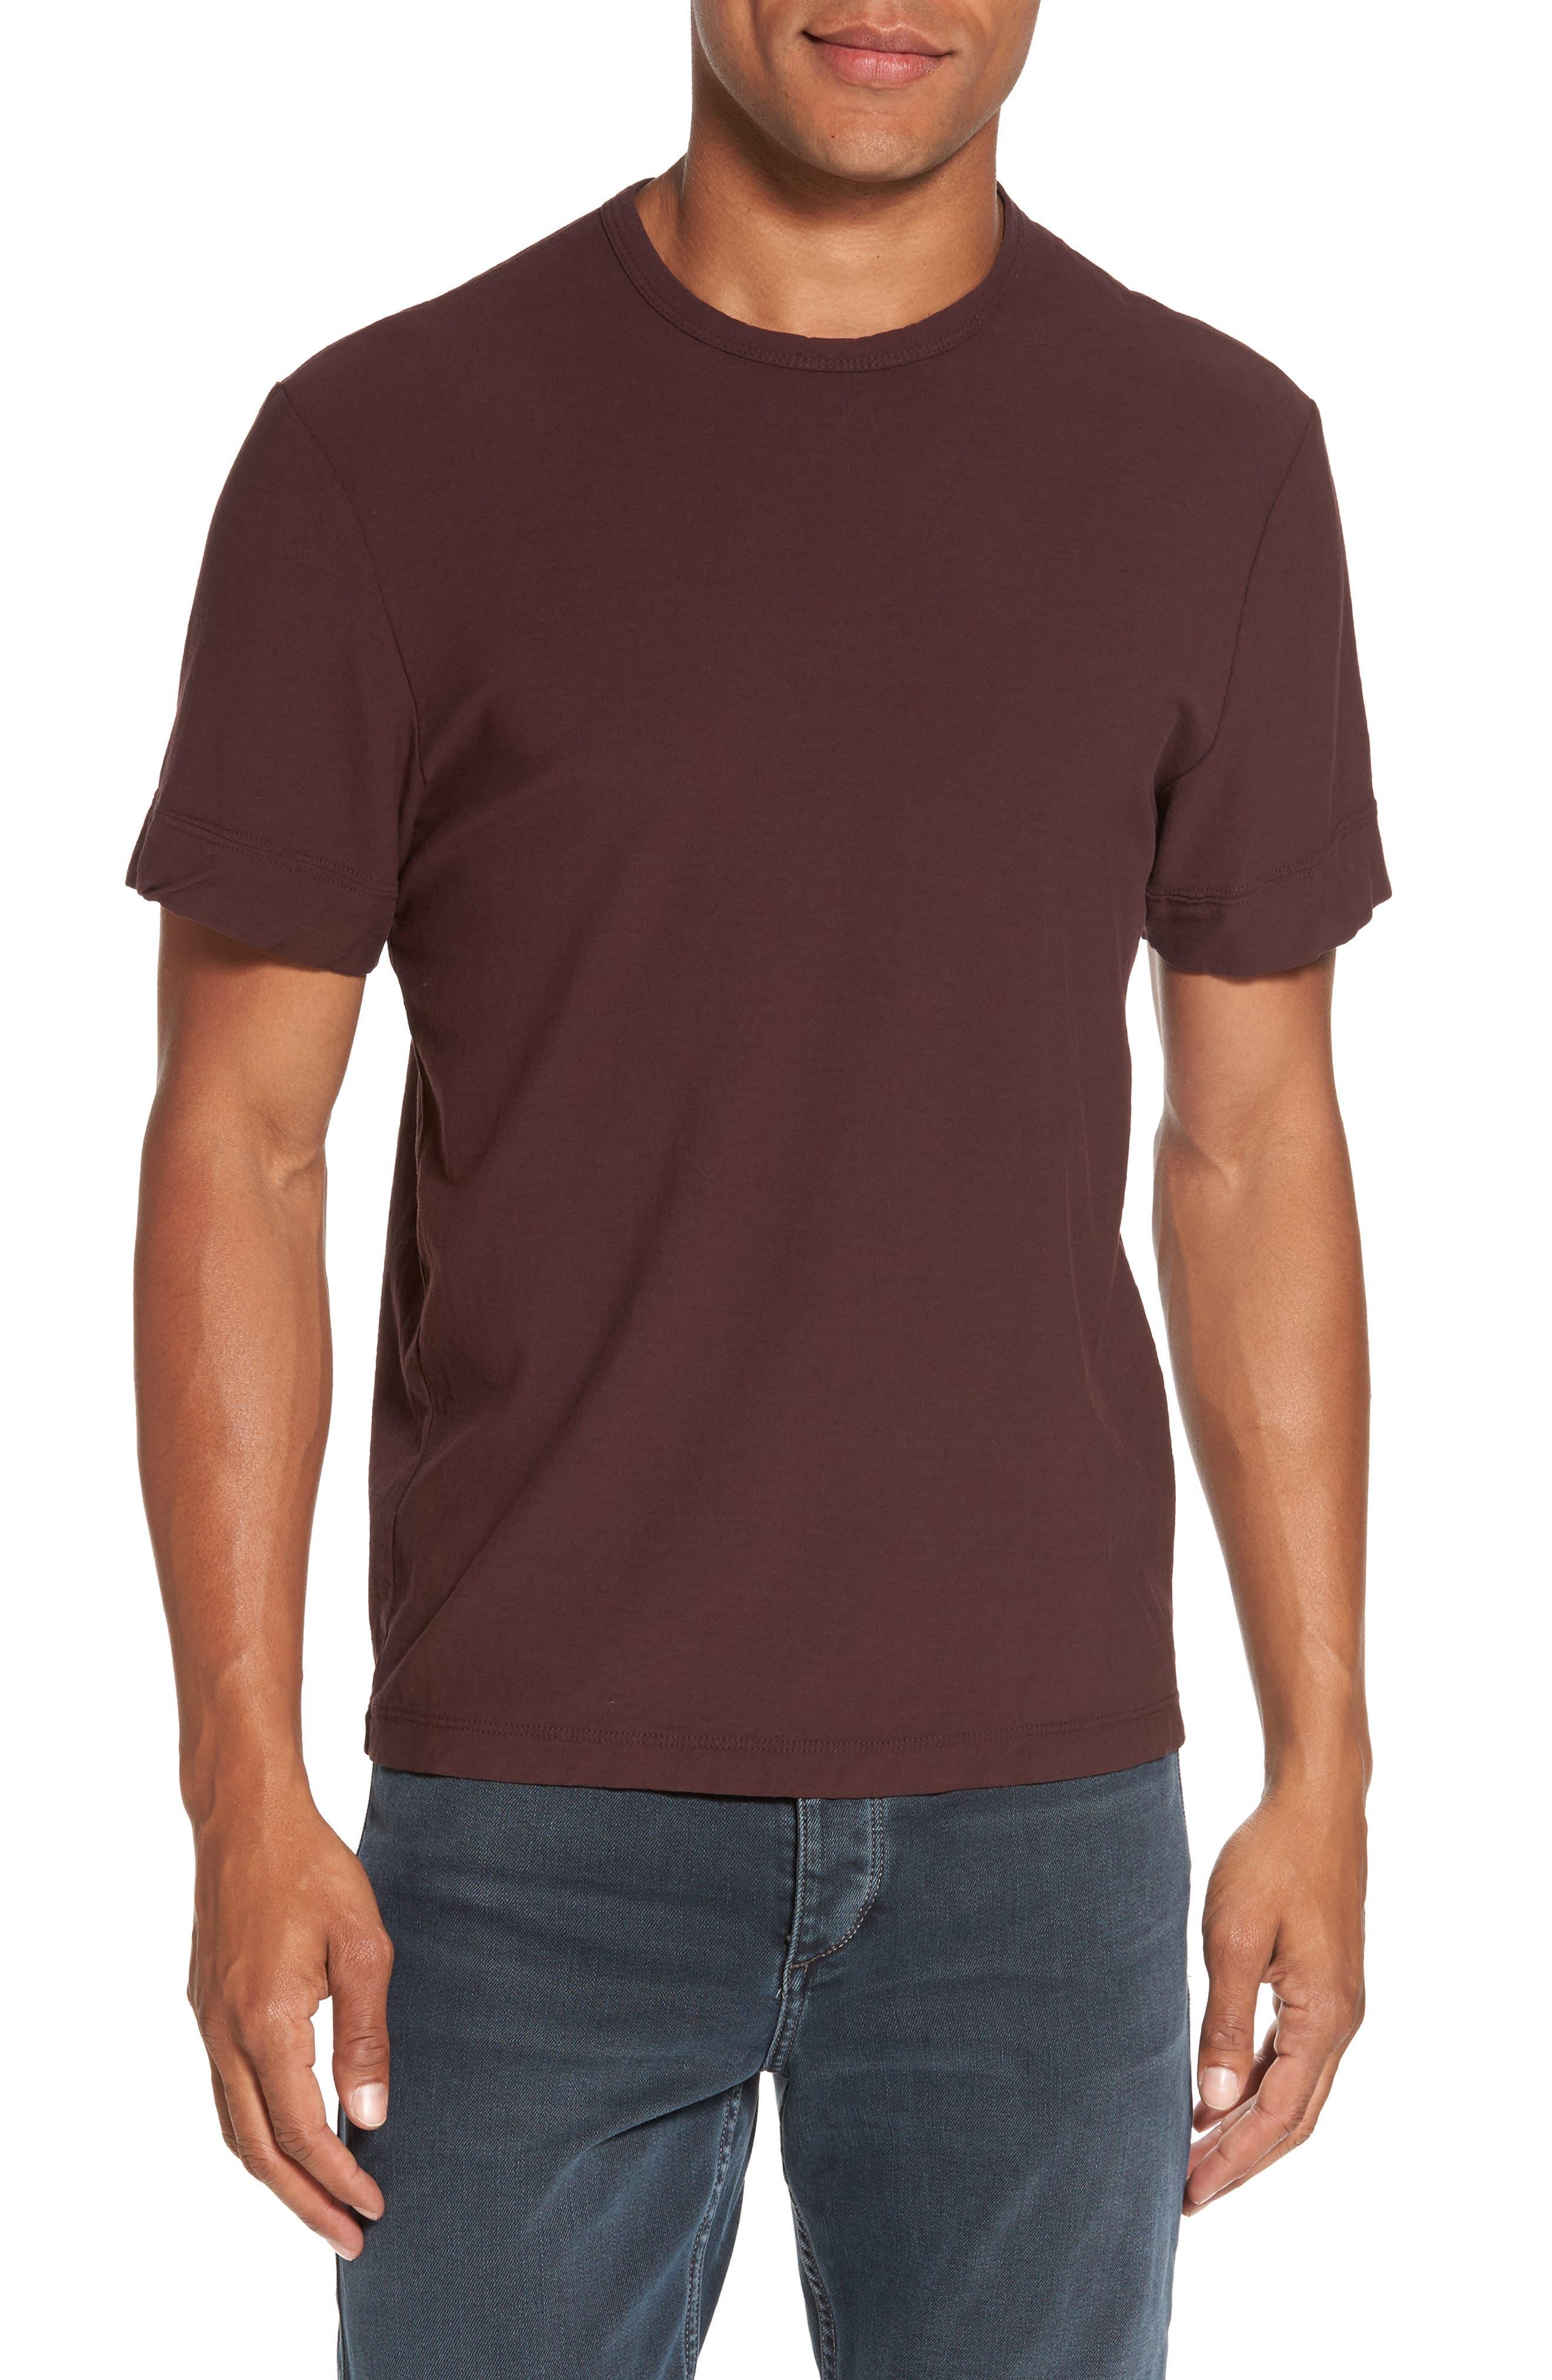 James Perse Classic Crewneck T-Shirt